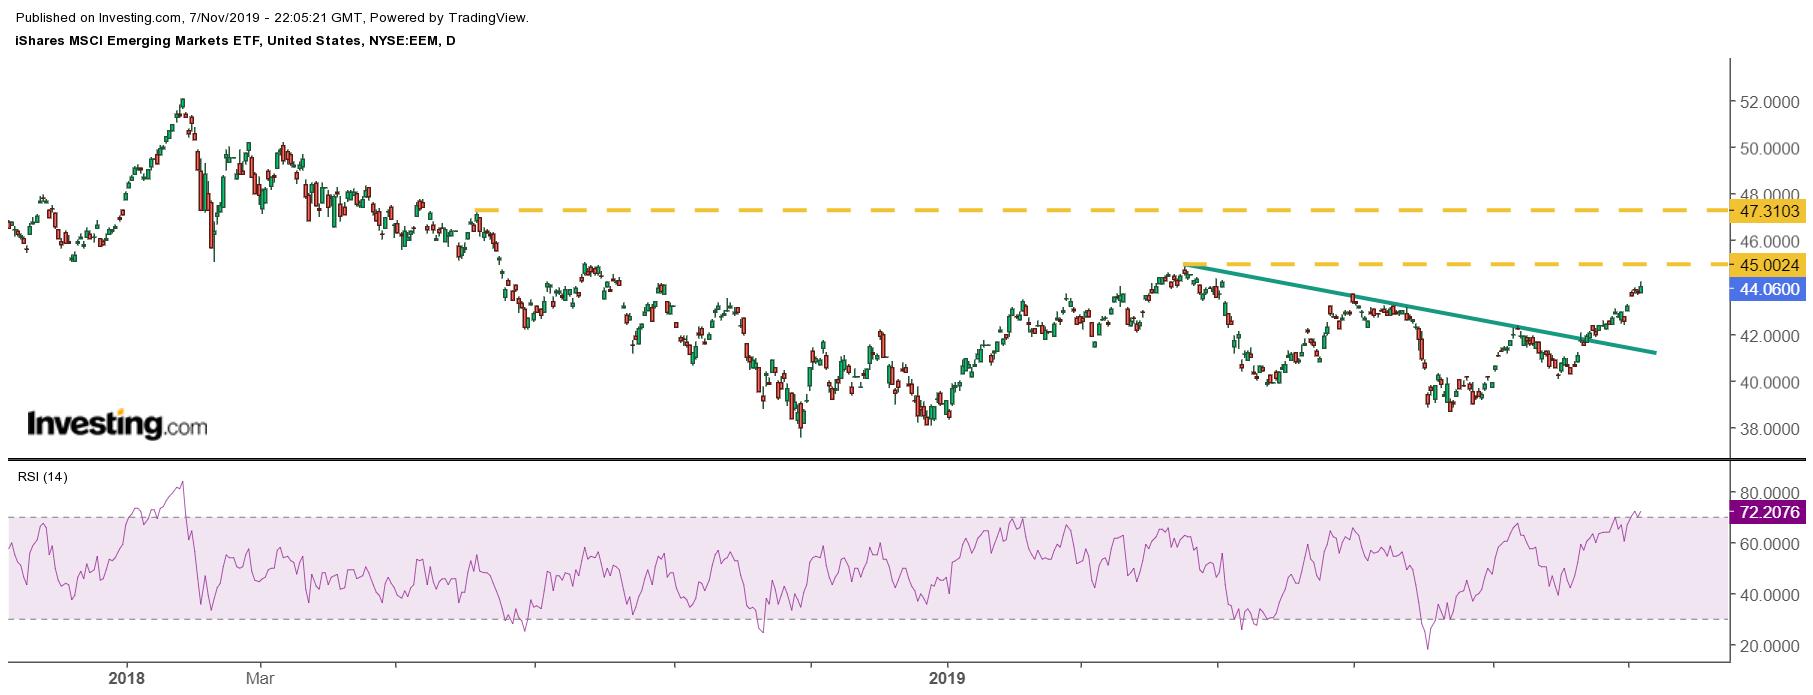 Emerging Markets ETF